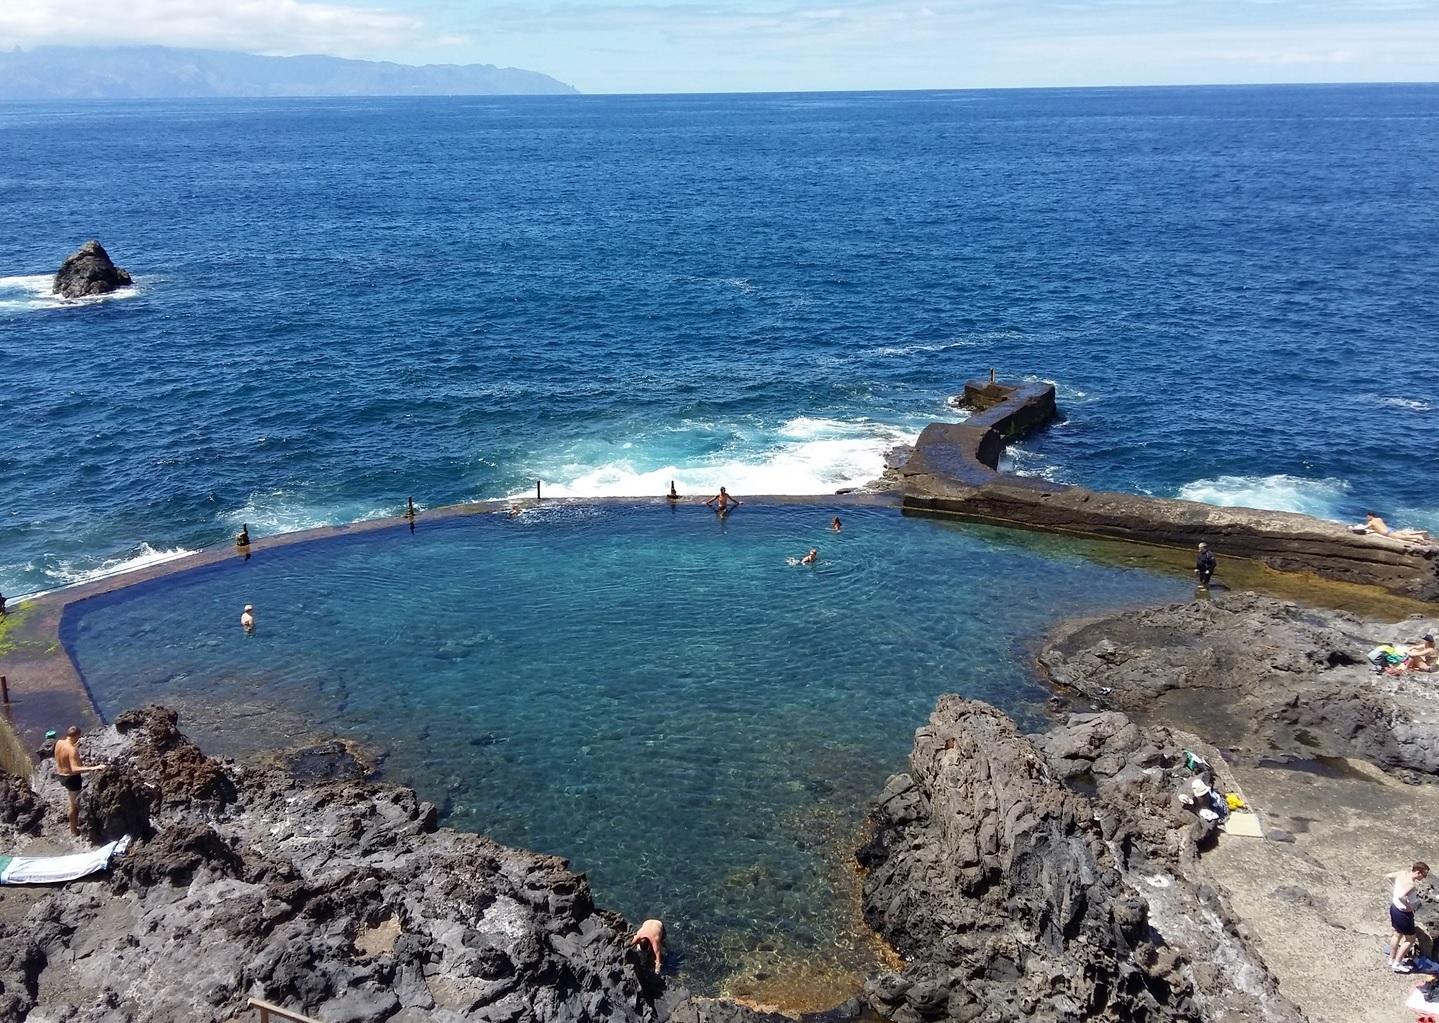 Tenerife - Voyageur Attitude